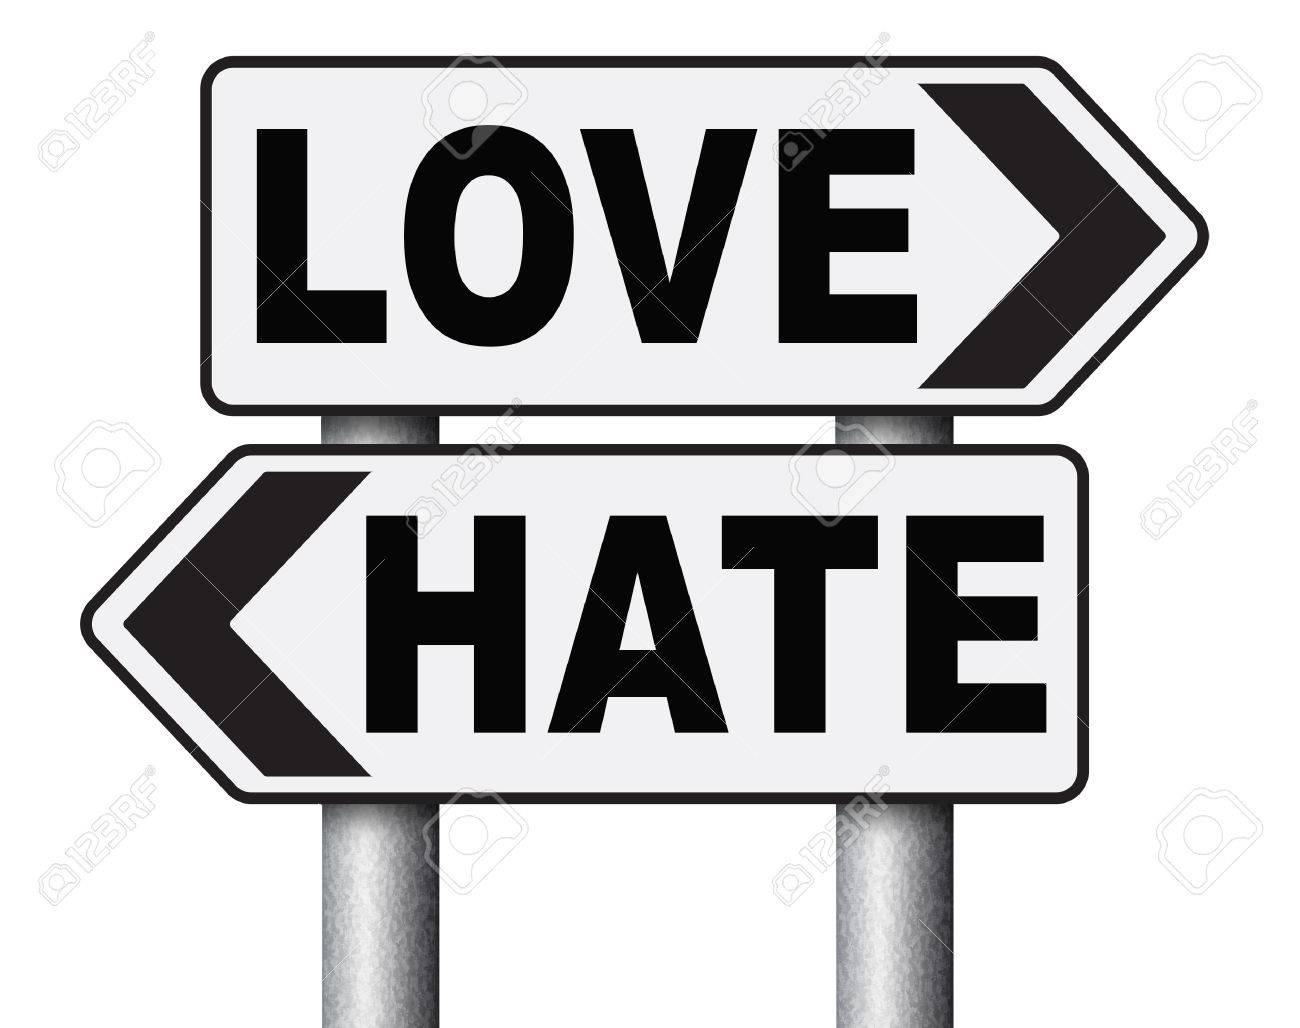 aus liebe wird hass